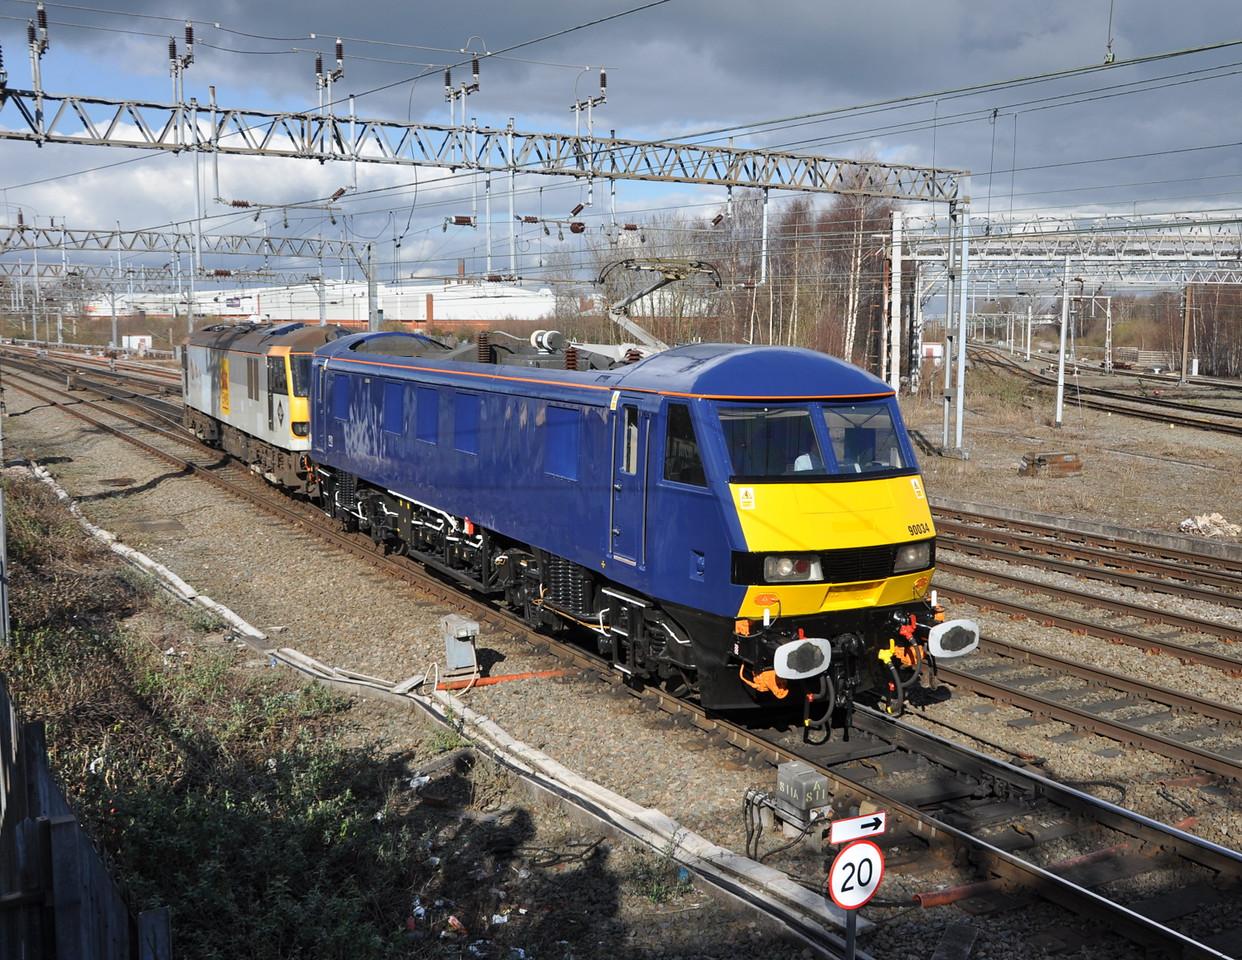 90034 and 92005, Crewe. 01/03/14.